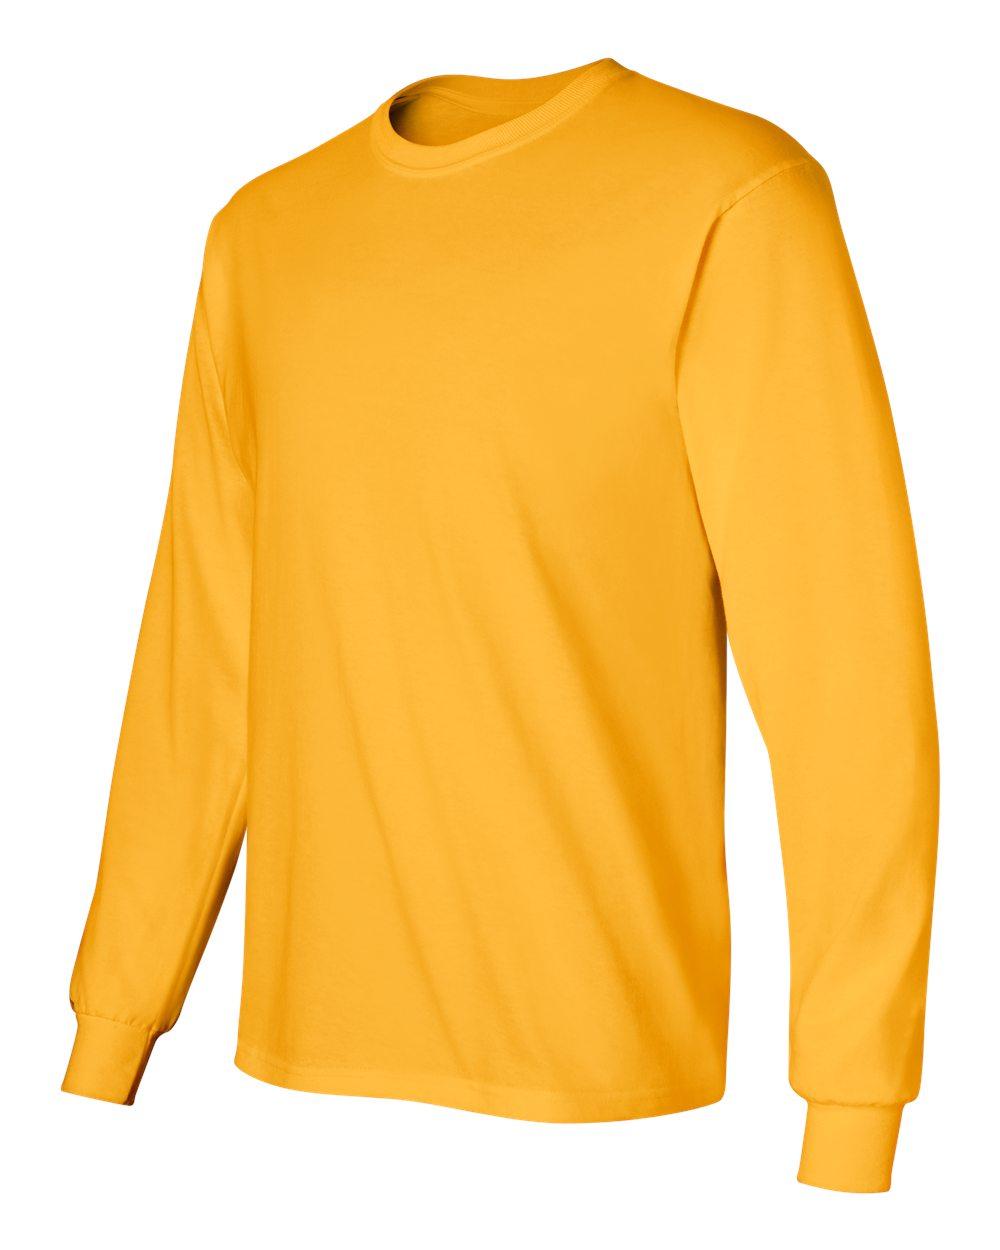 7ba8a2ff0990 Gildan 2400 - Ultra Cotton Long Sleeve T-Shirt - Friendly Arctic Printing